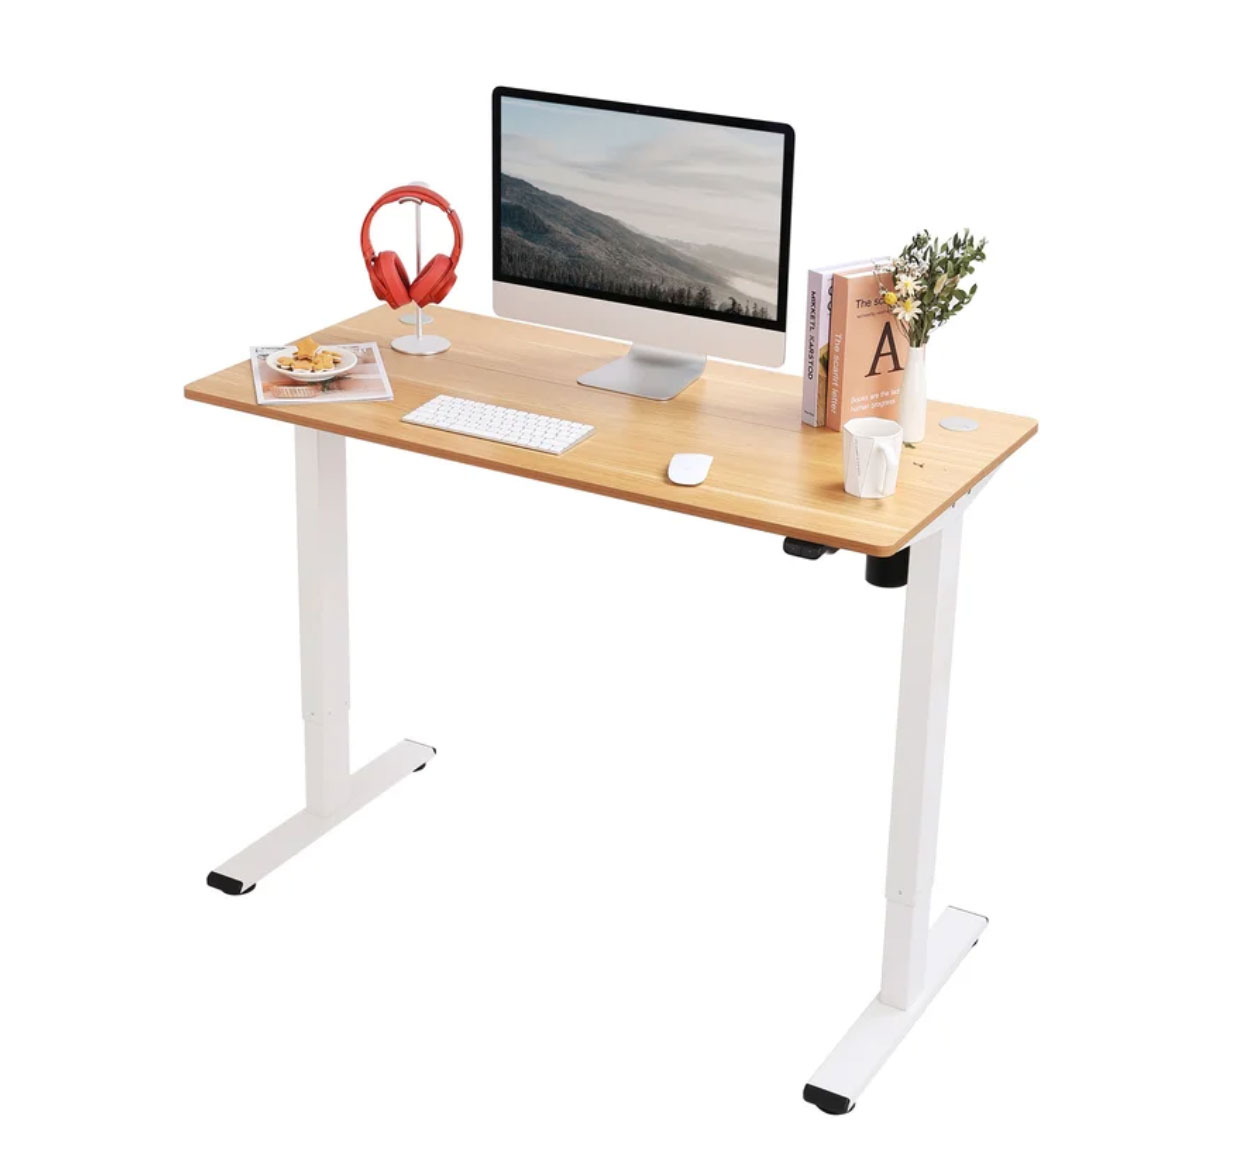 Flexispot Desk Review